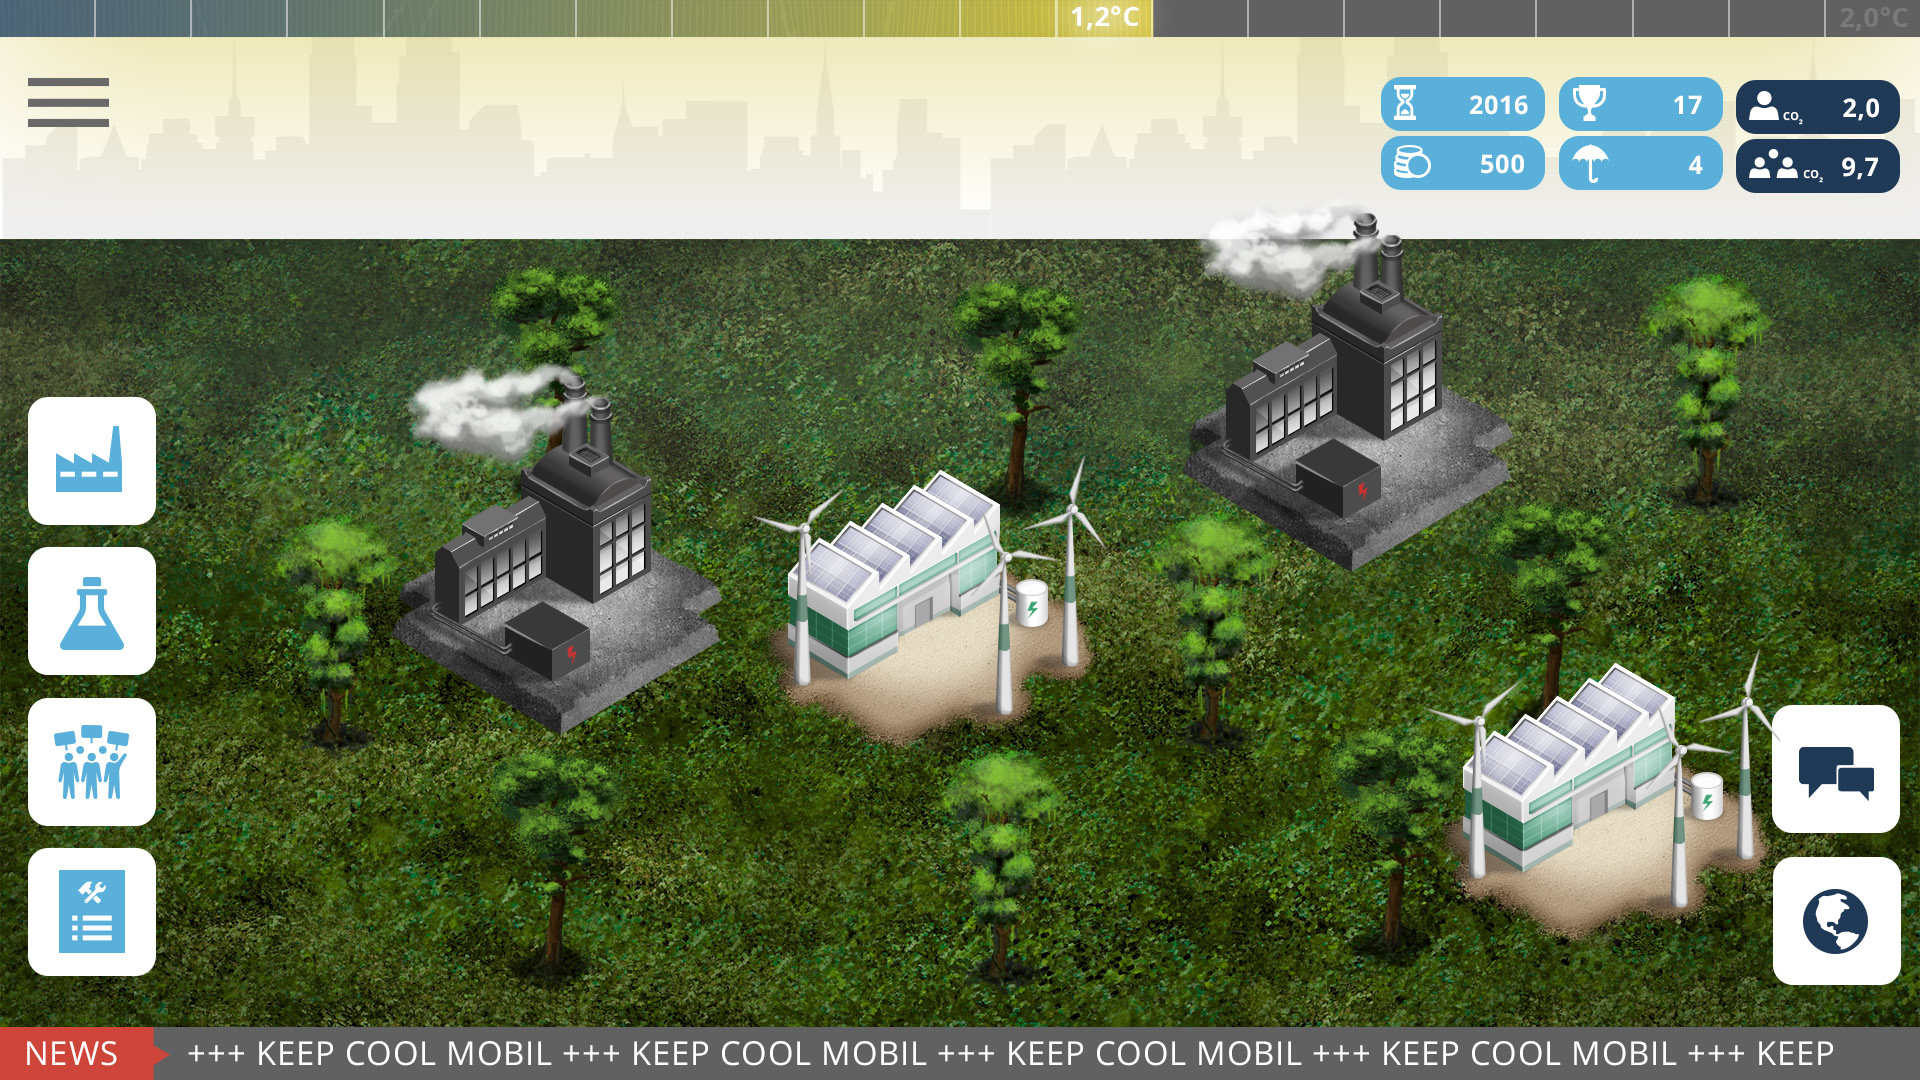 Keep Cool mobil - Das Multiplayer-Game zur Klimapolitik